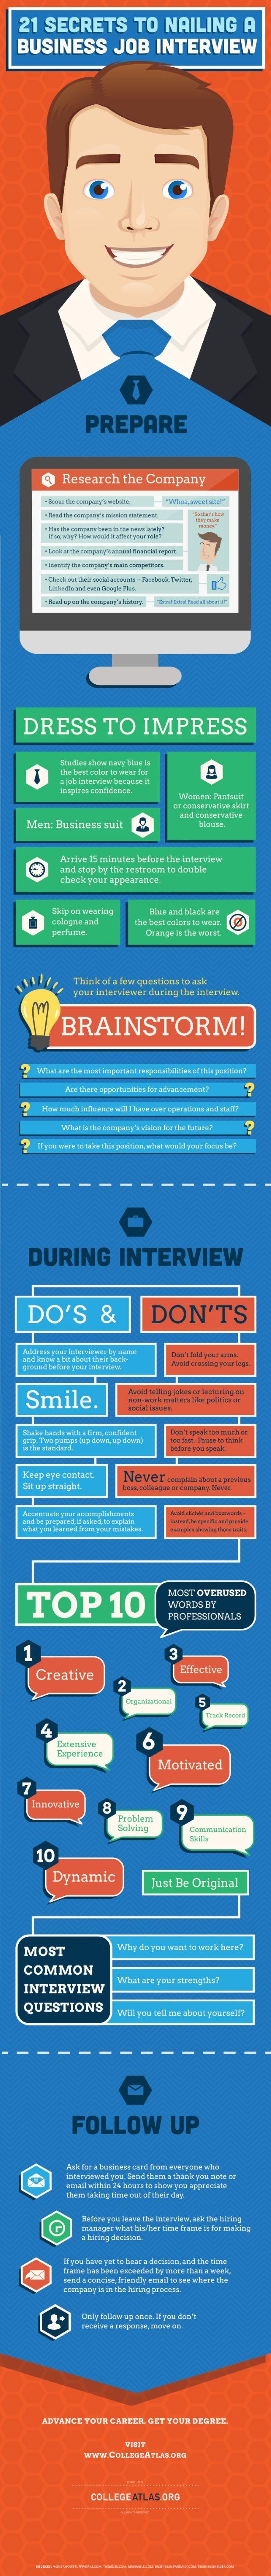 21 Secrets To Nailing A Job Interview